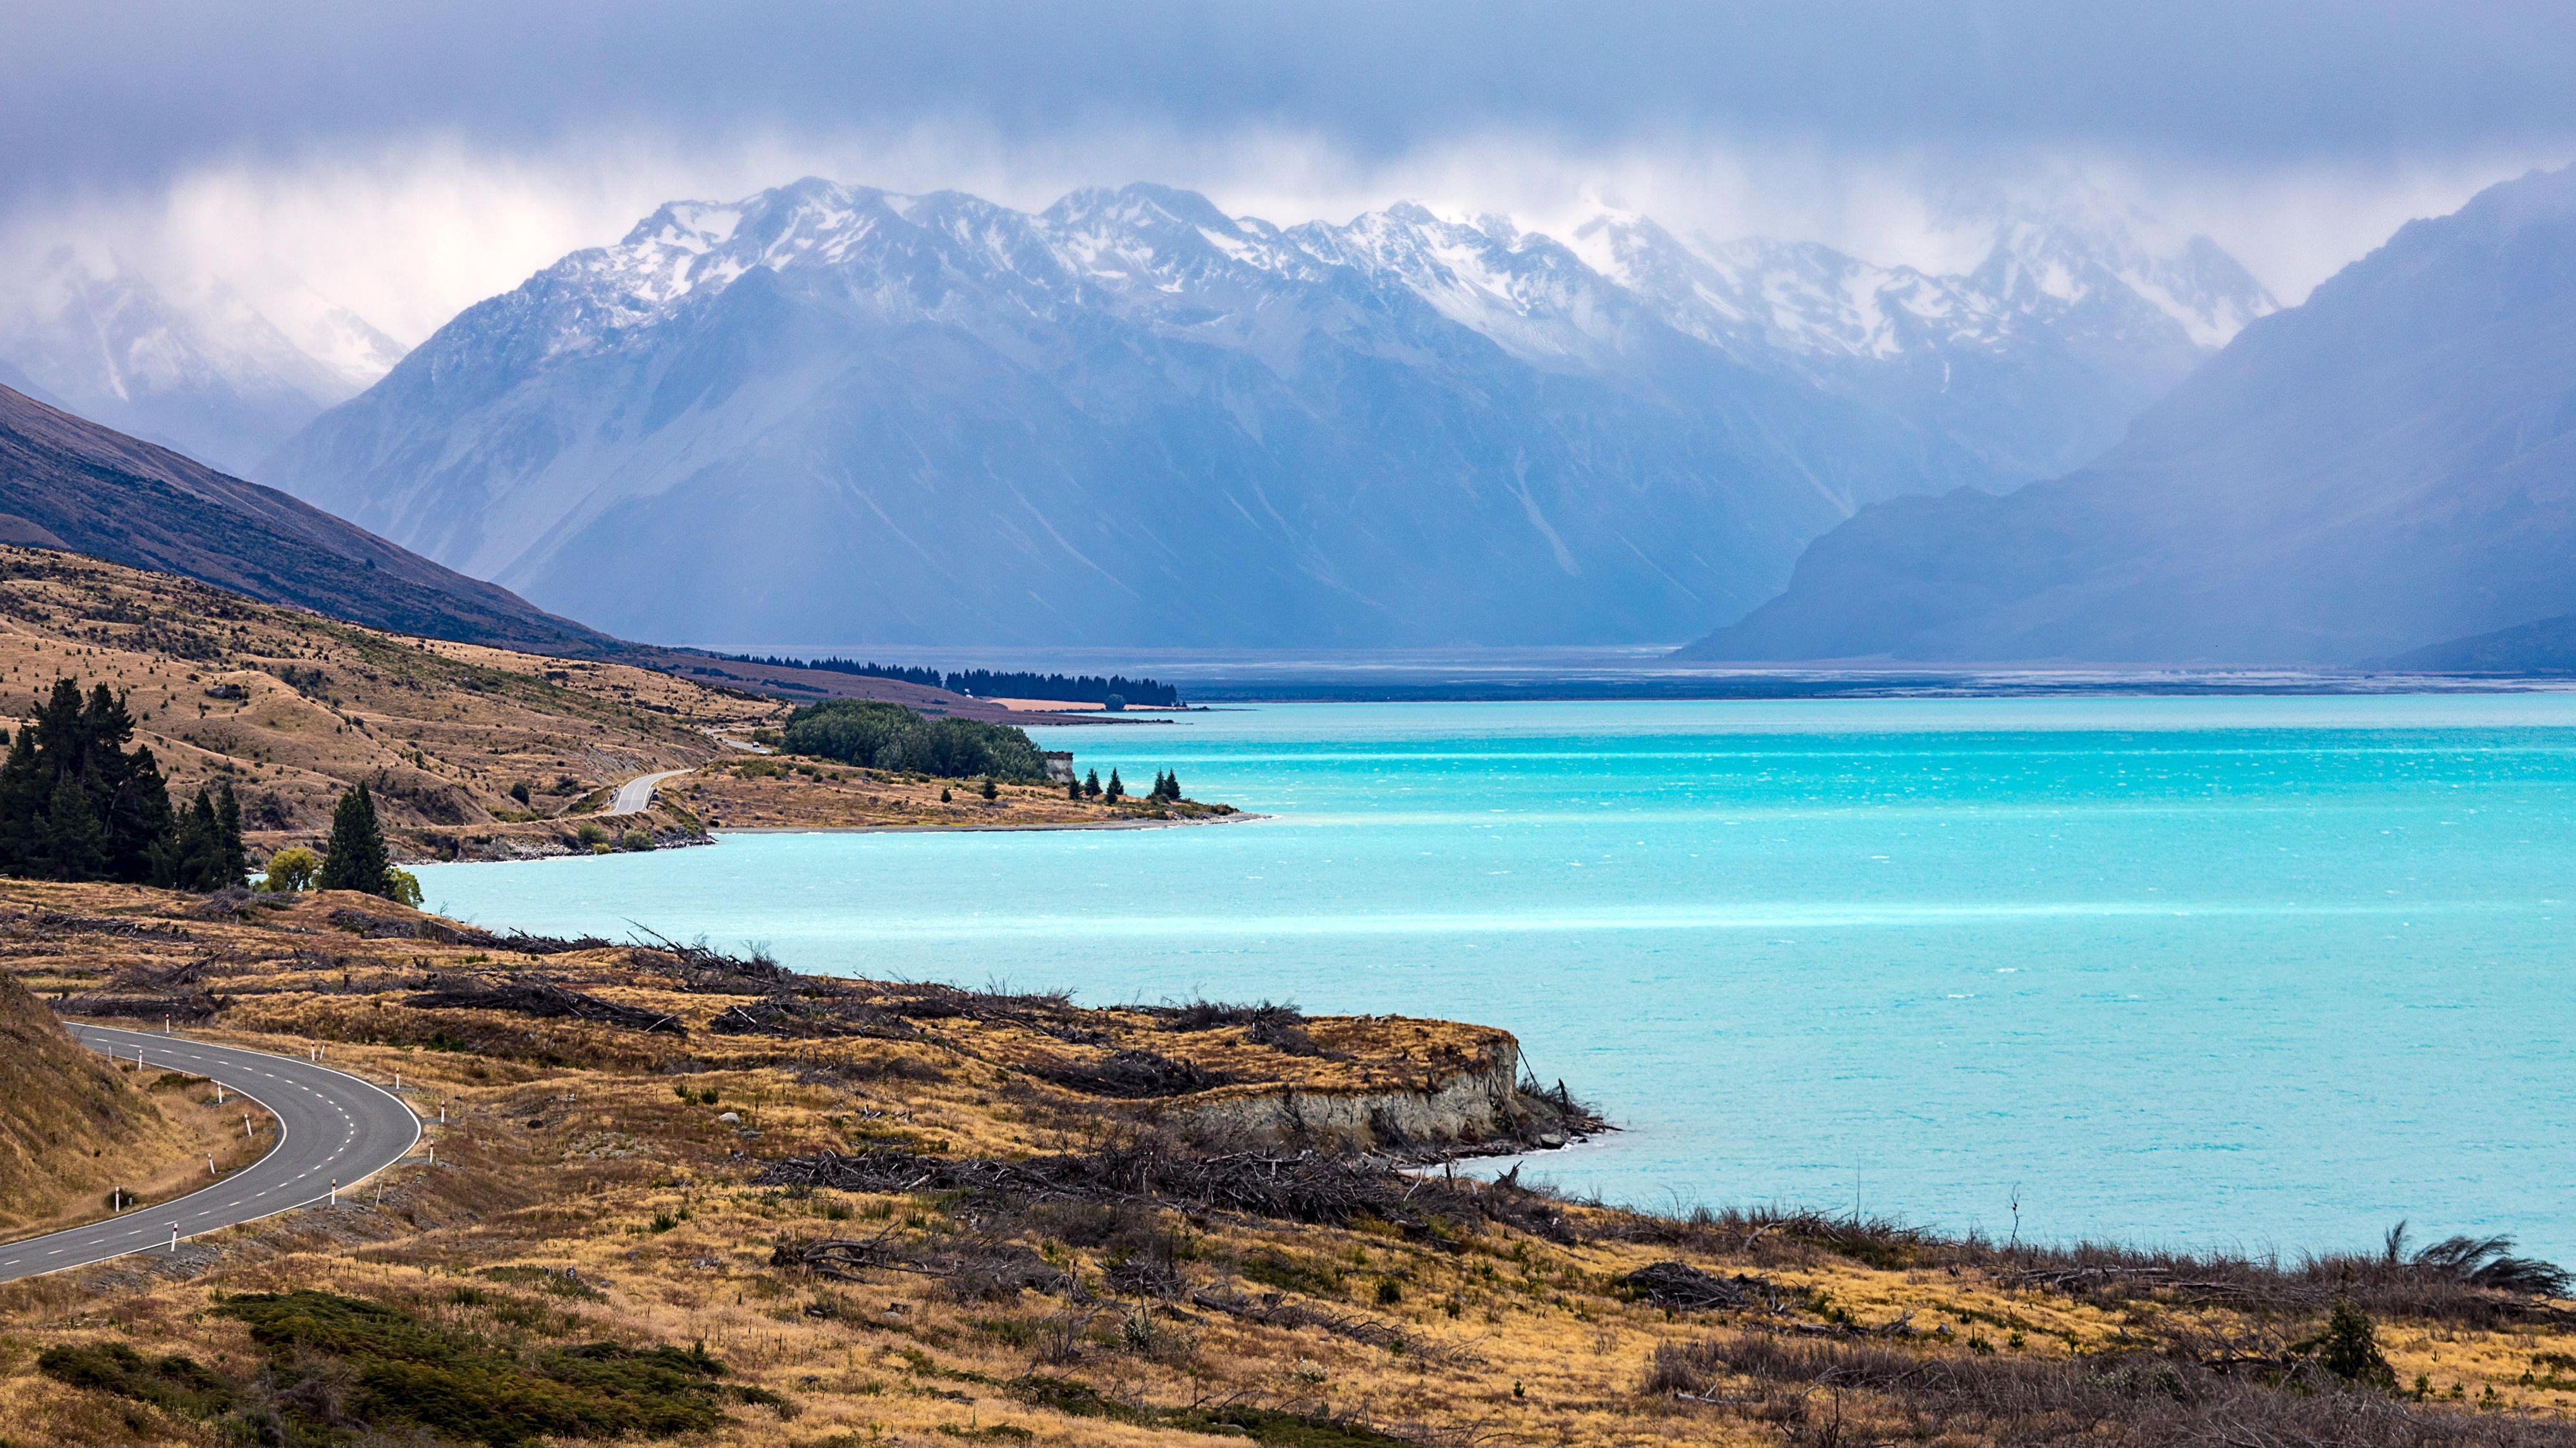 Der türkisfarbene See Pukaki in Neuseeland